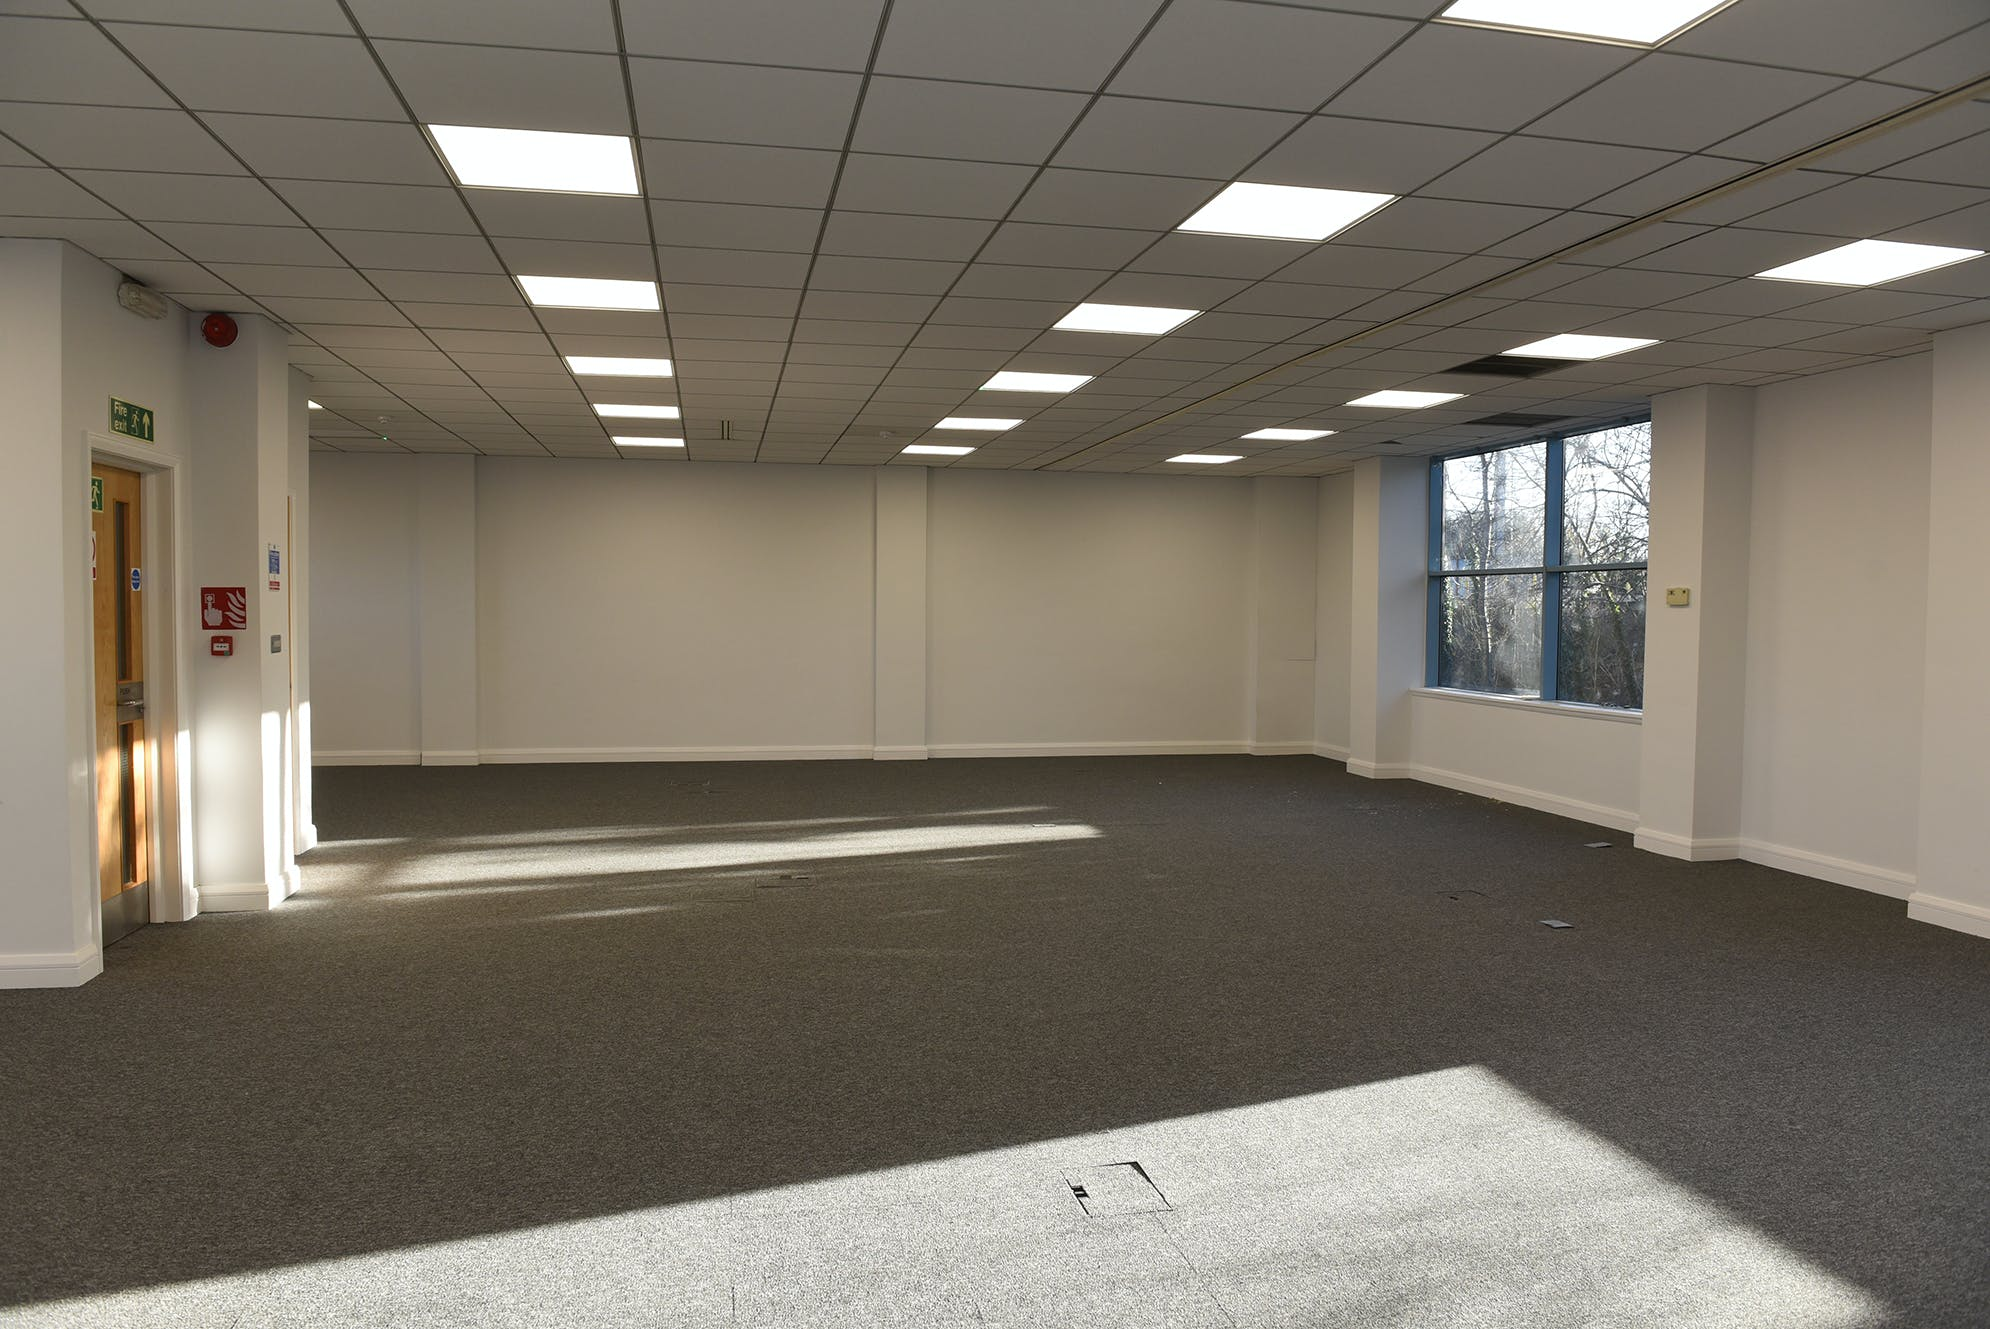 3 & 4 Bell Business Centre, Maidenhead, Offices To Let - cef5951e818cefc631c9e09dea3200ee49a68458.jpg